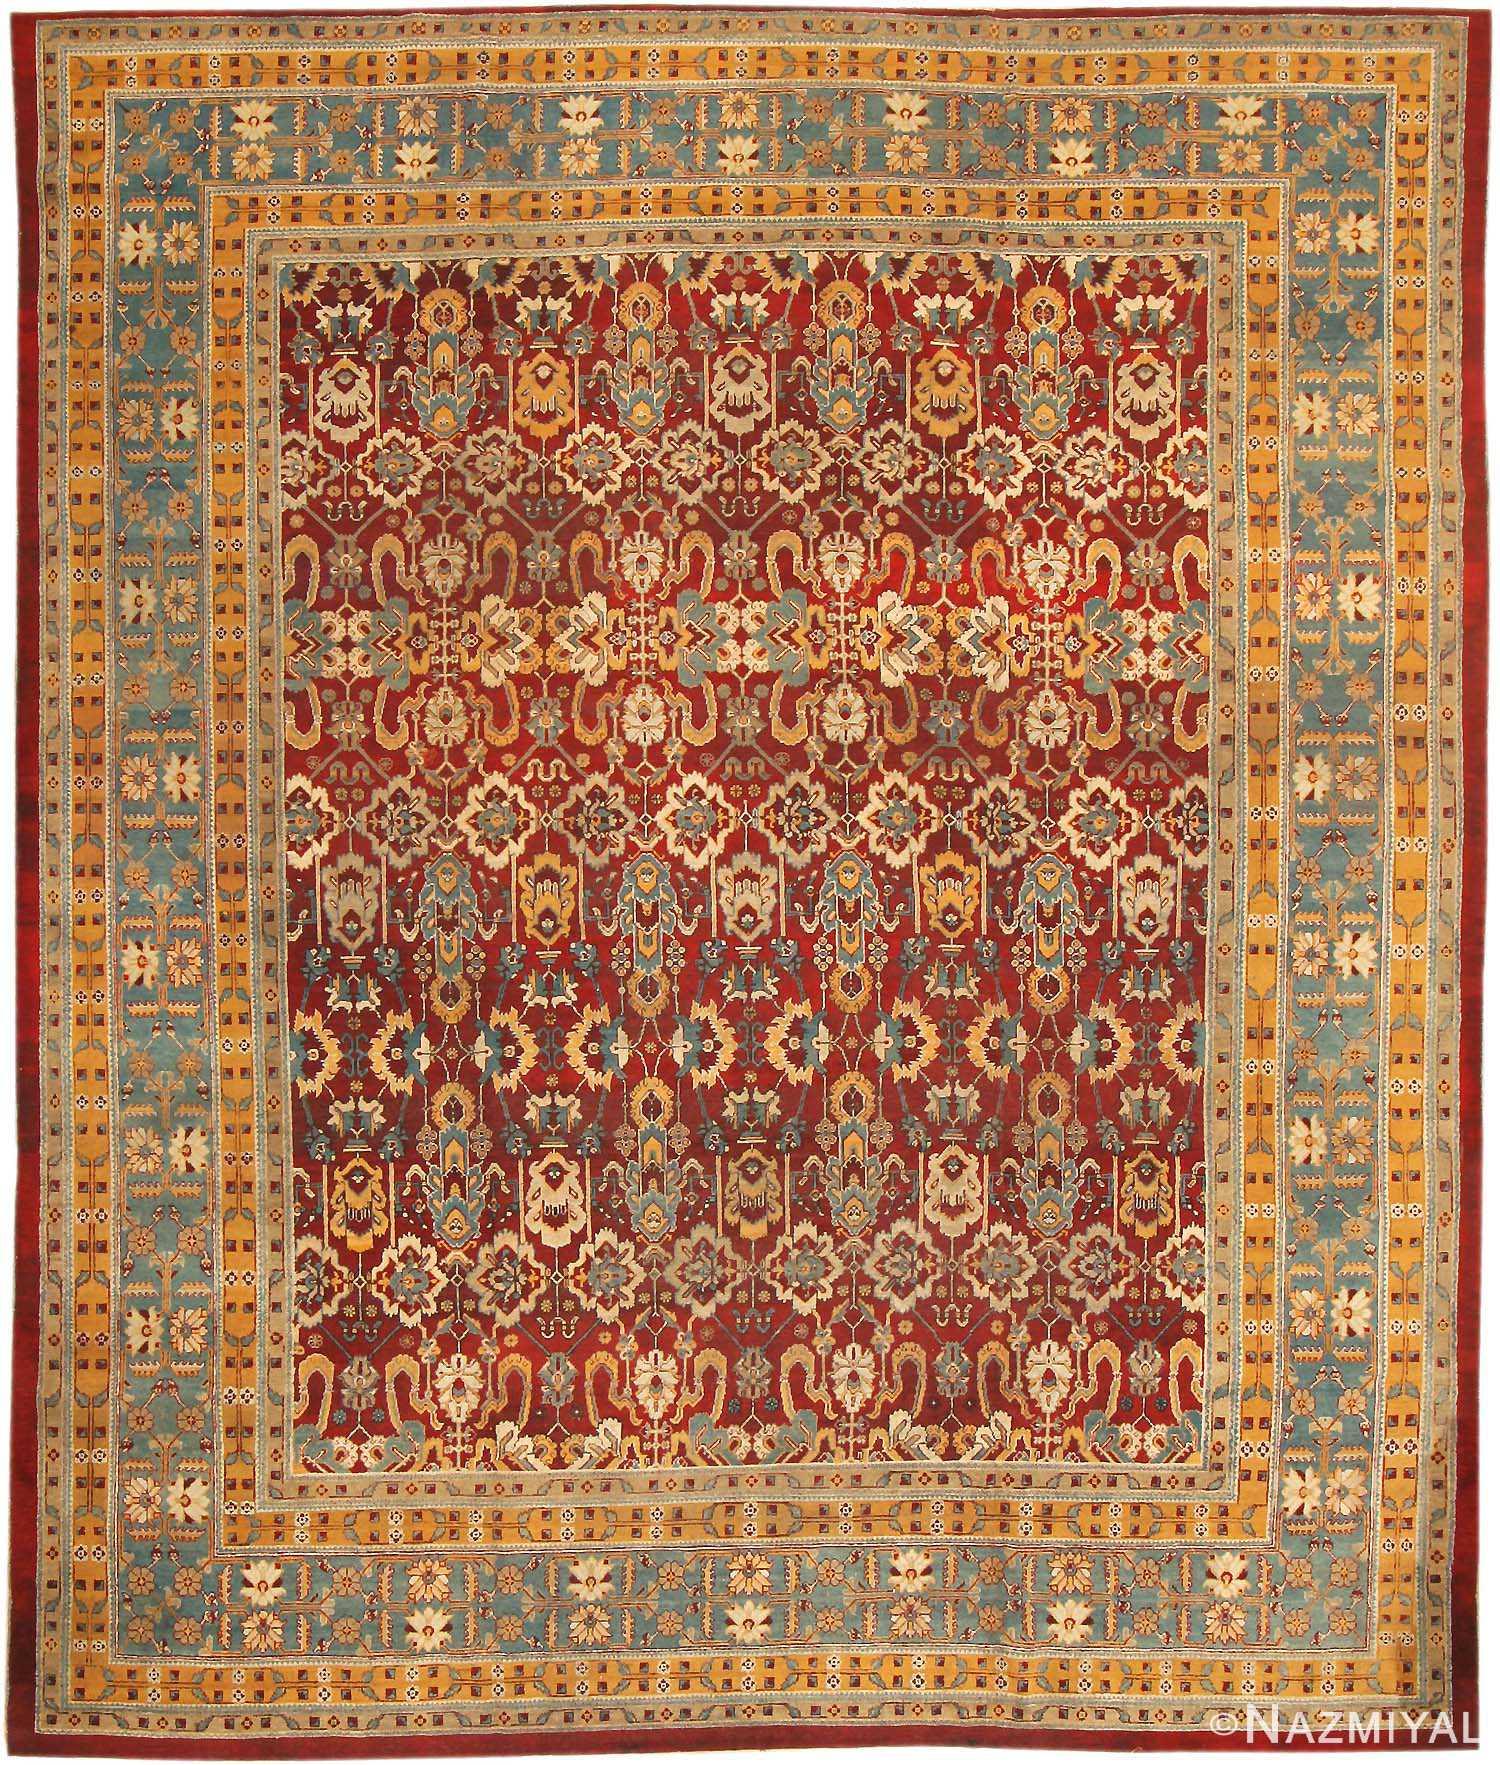 Antique Amritsar Oriental Rug 2670 Nazmiyal